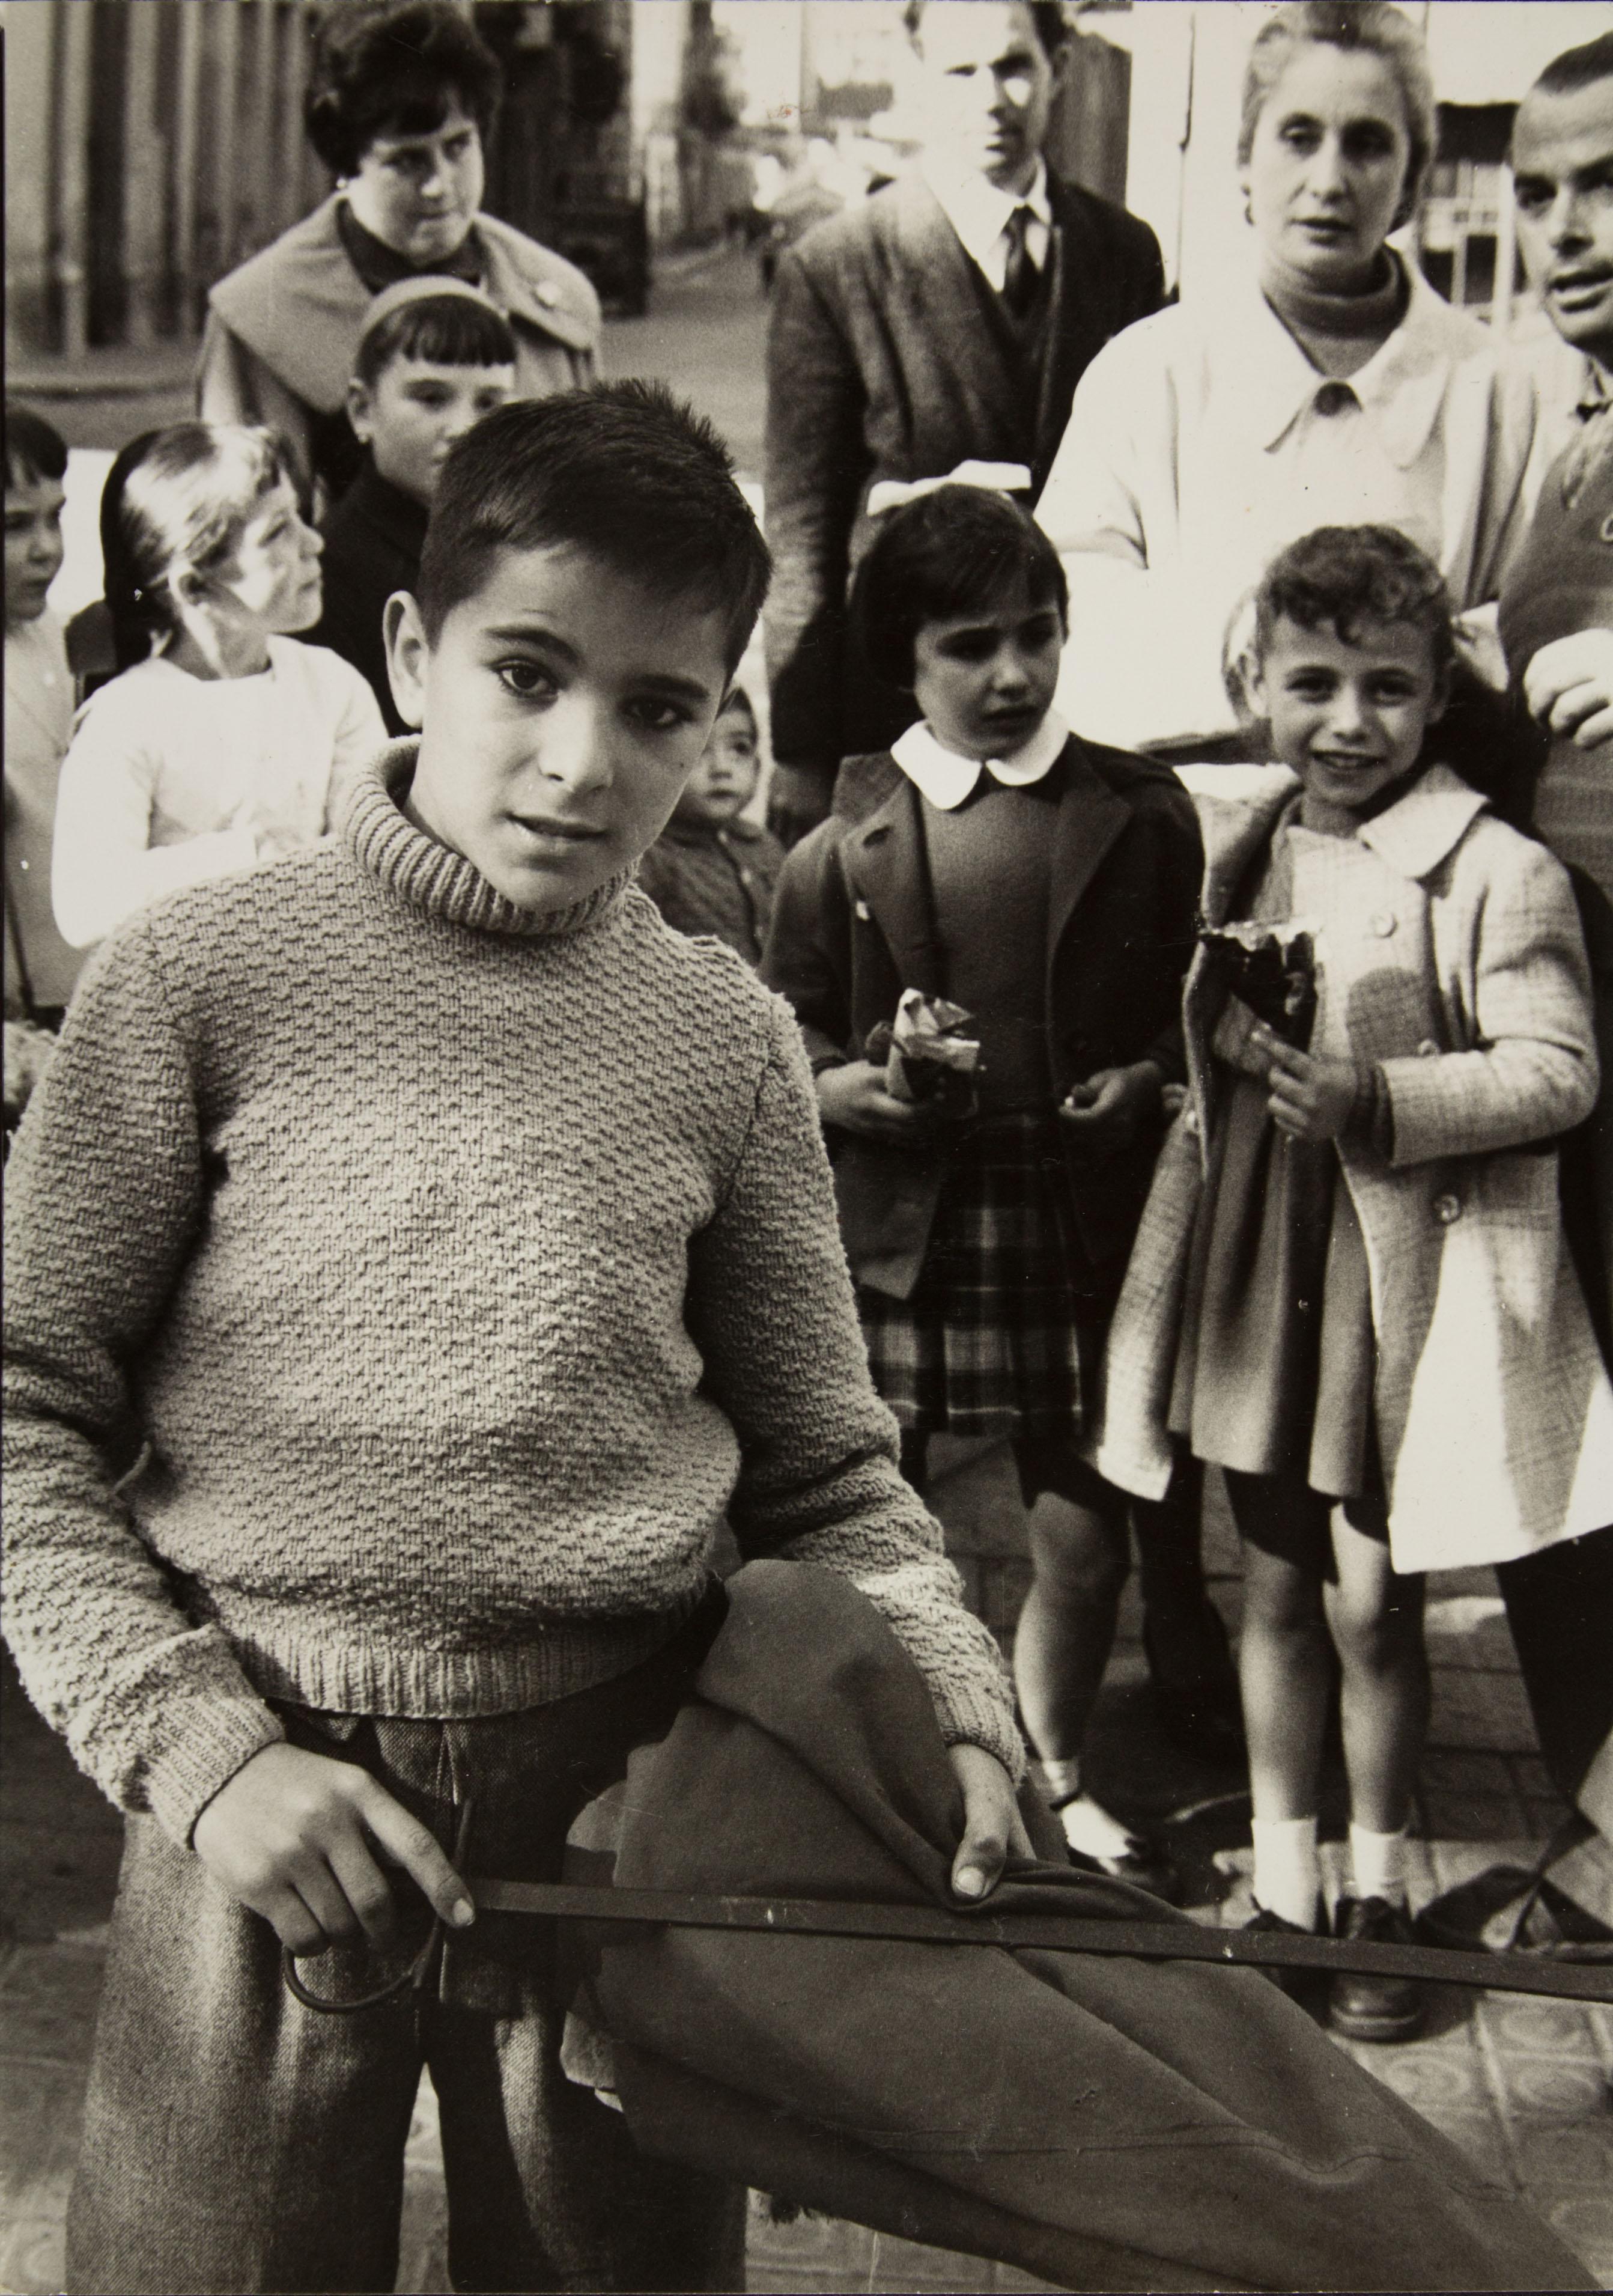 Oriol Maspons - Sense títol (Barcelona) - 1958